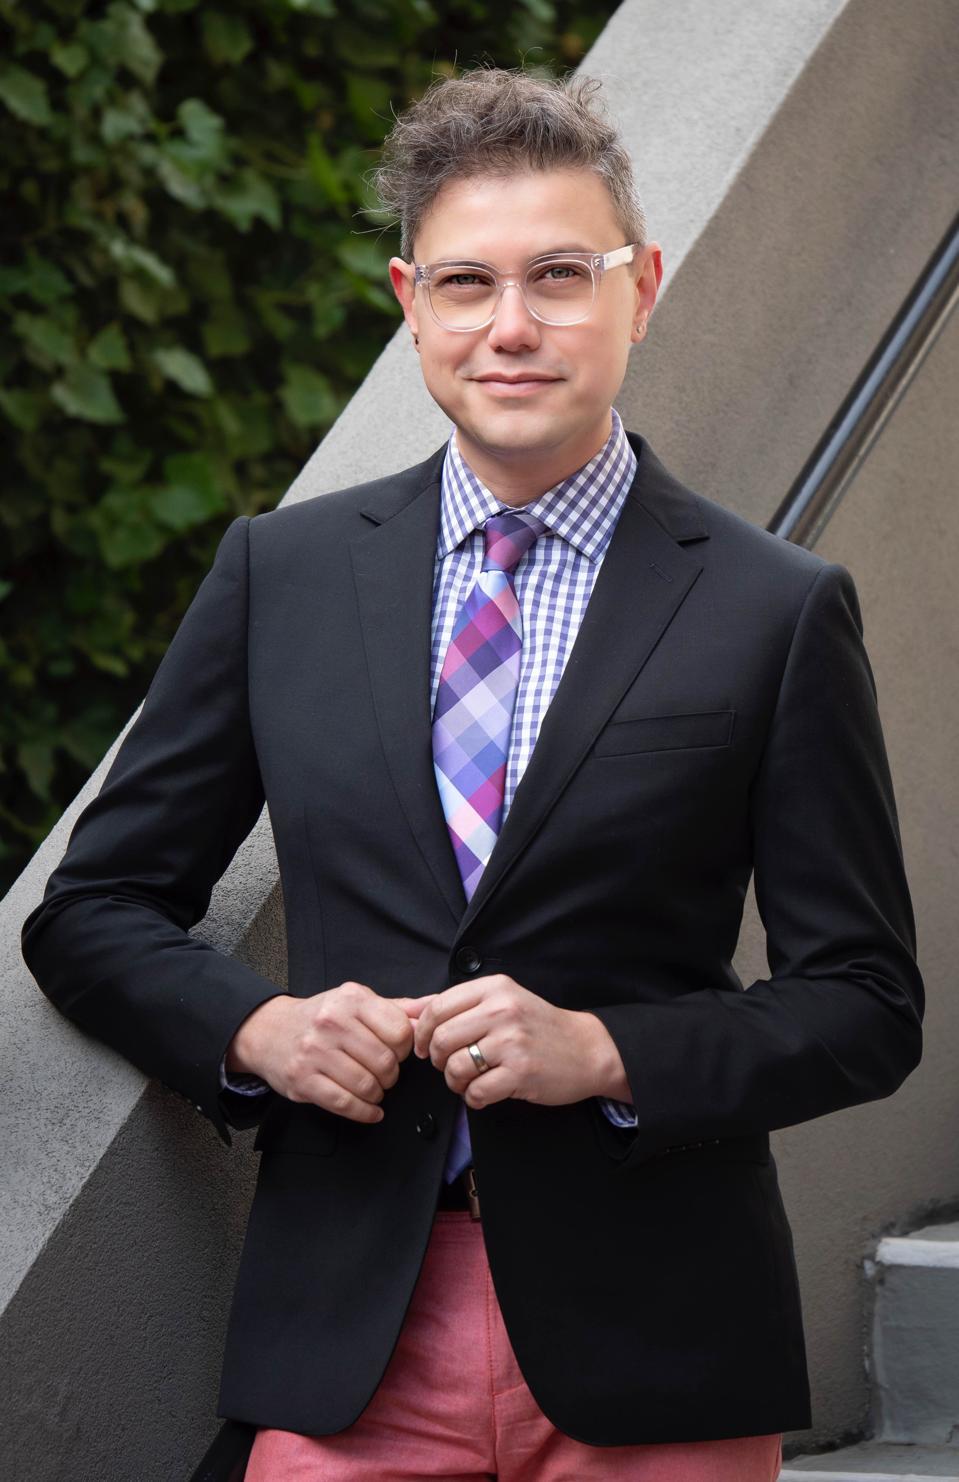 Evren Odcikin is the associate artistic director of the Oregon Shakespeare Festival (OSF).